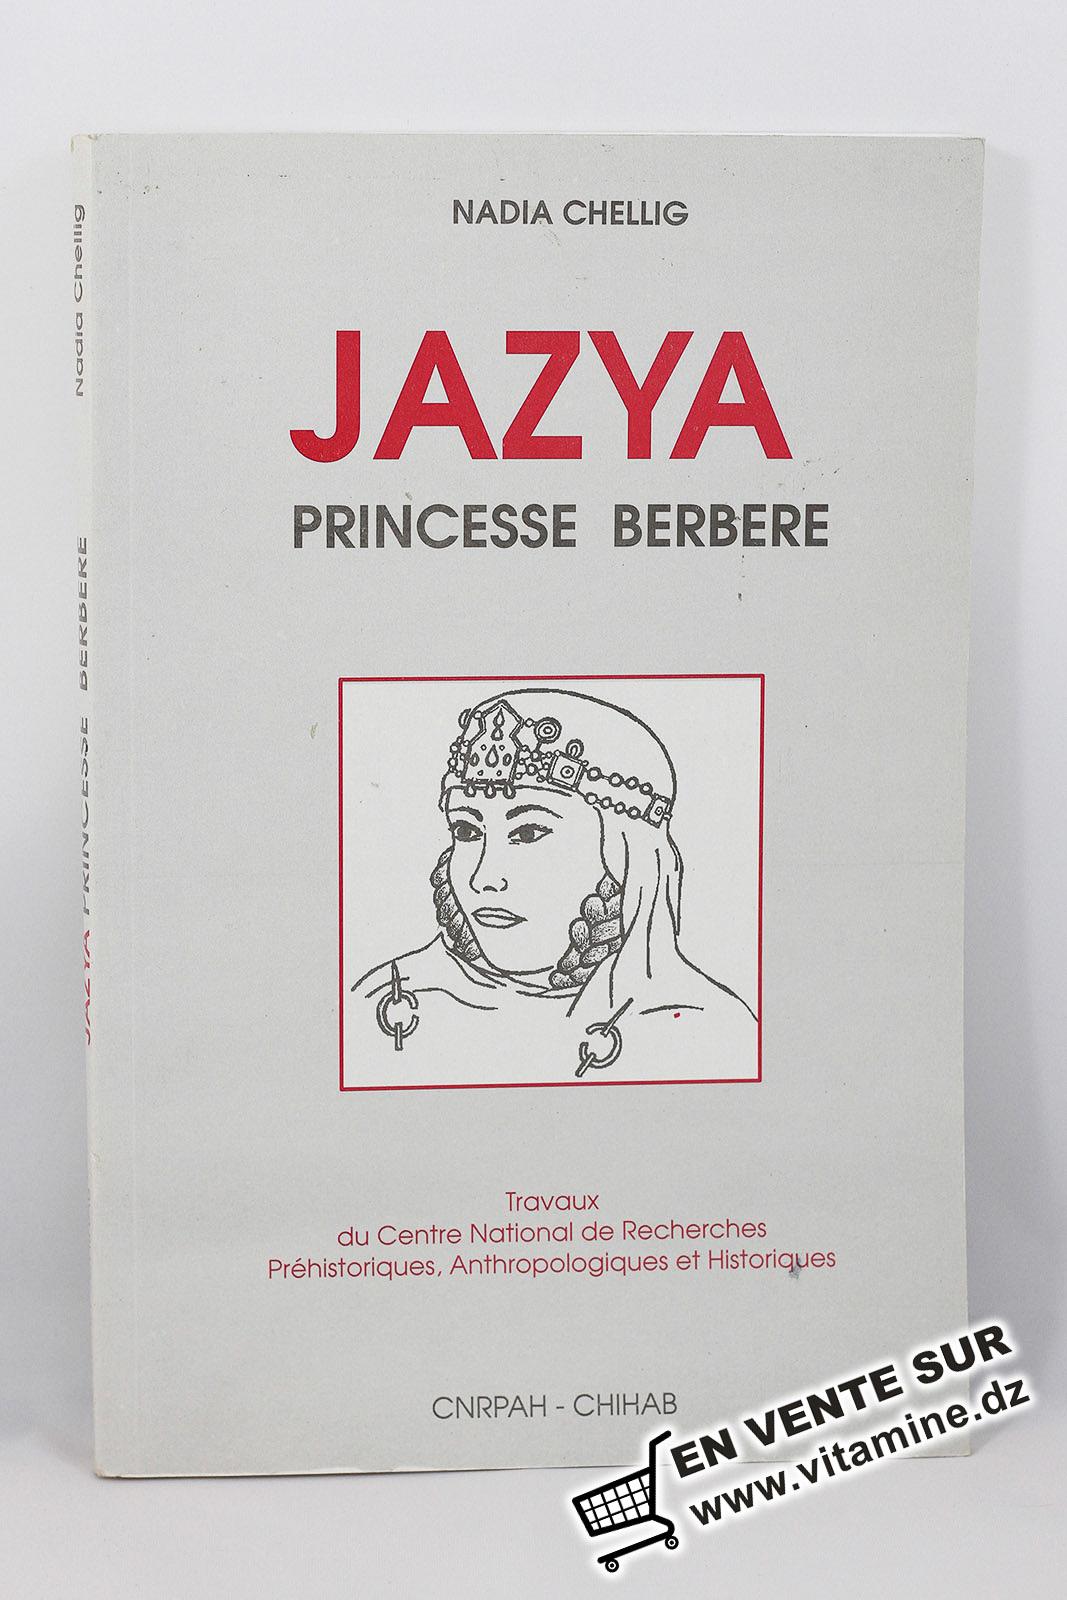 Nadia Chellig - Jazya princesse berbere